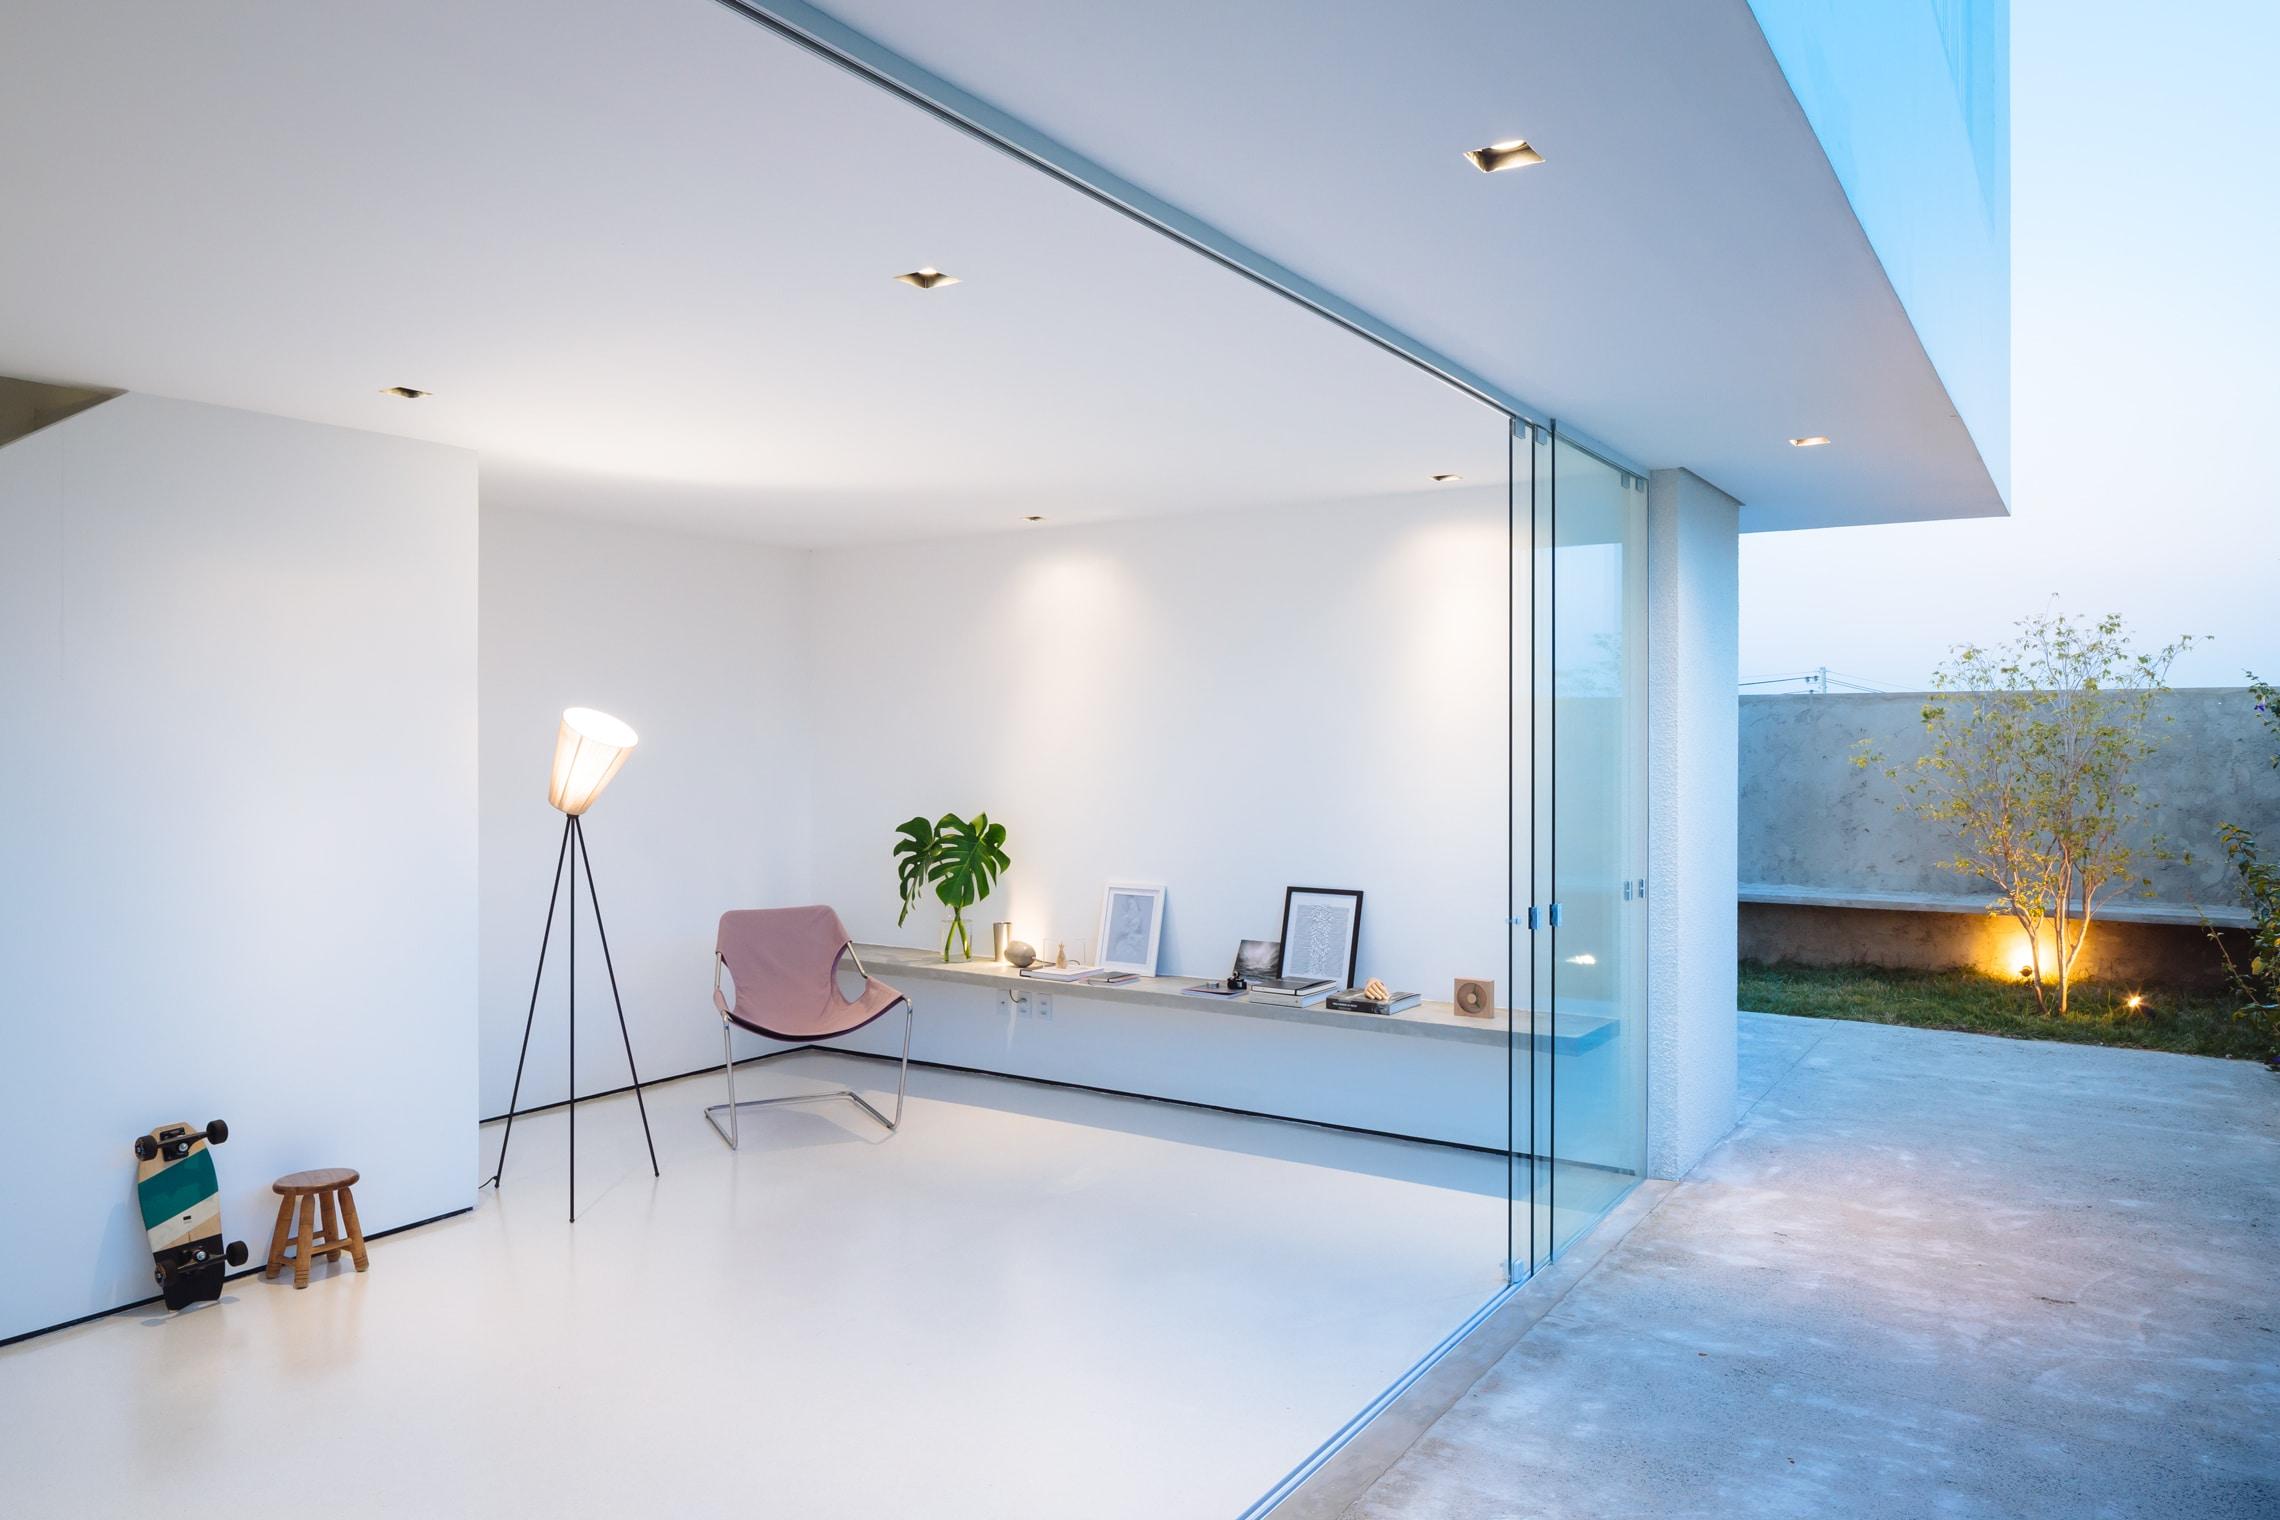 Sencilla casa de dos pisos con planos y dise o de interiores for Pisos interiores